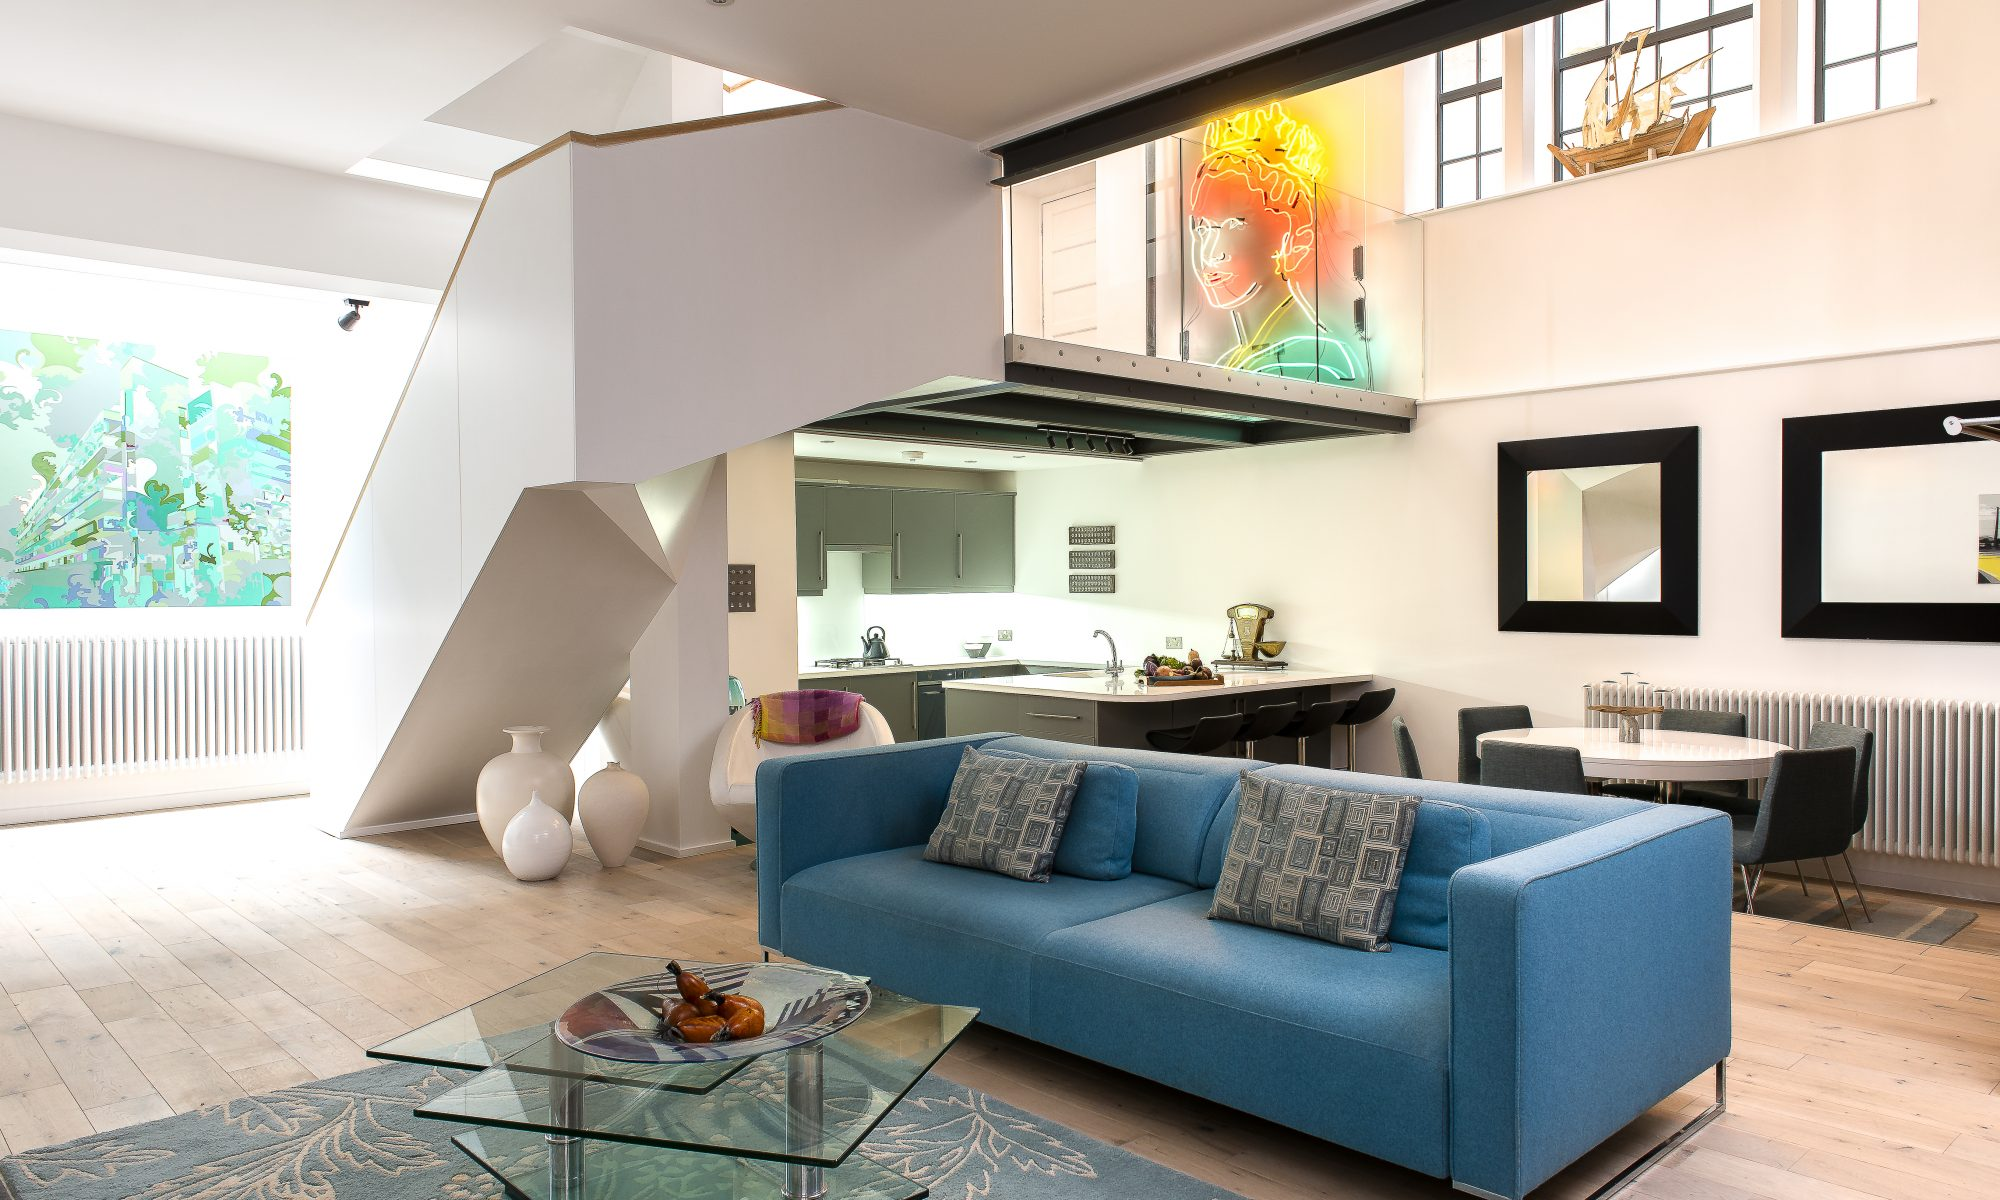 The main living area